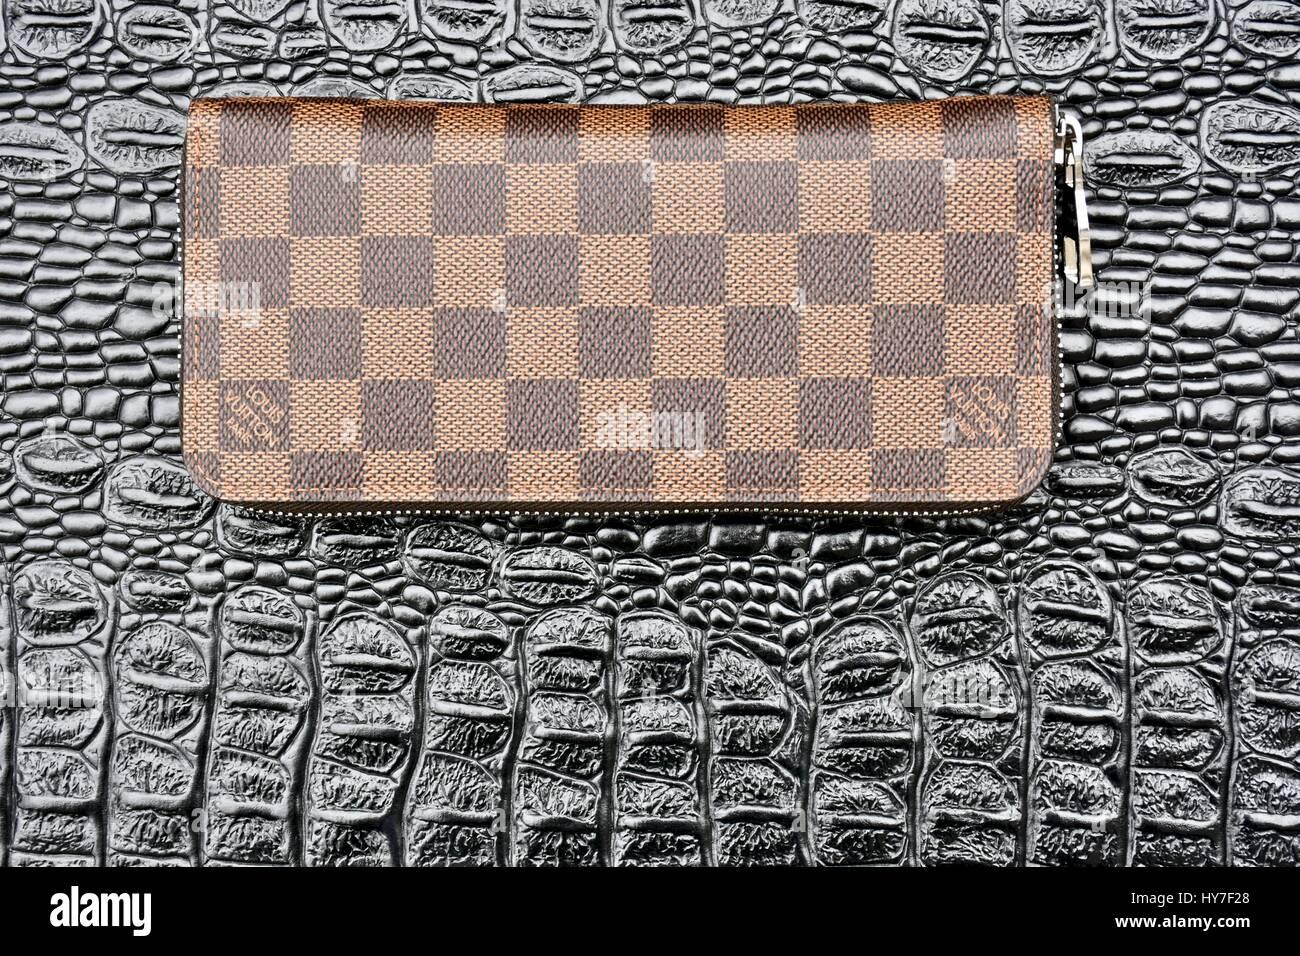 Louis Vuitton zippy wallet Stock Photo